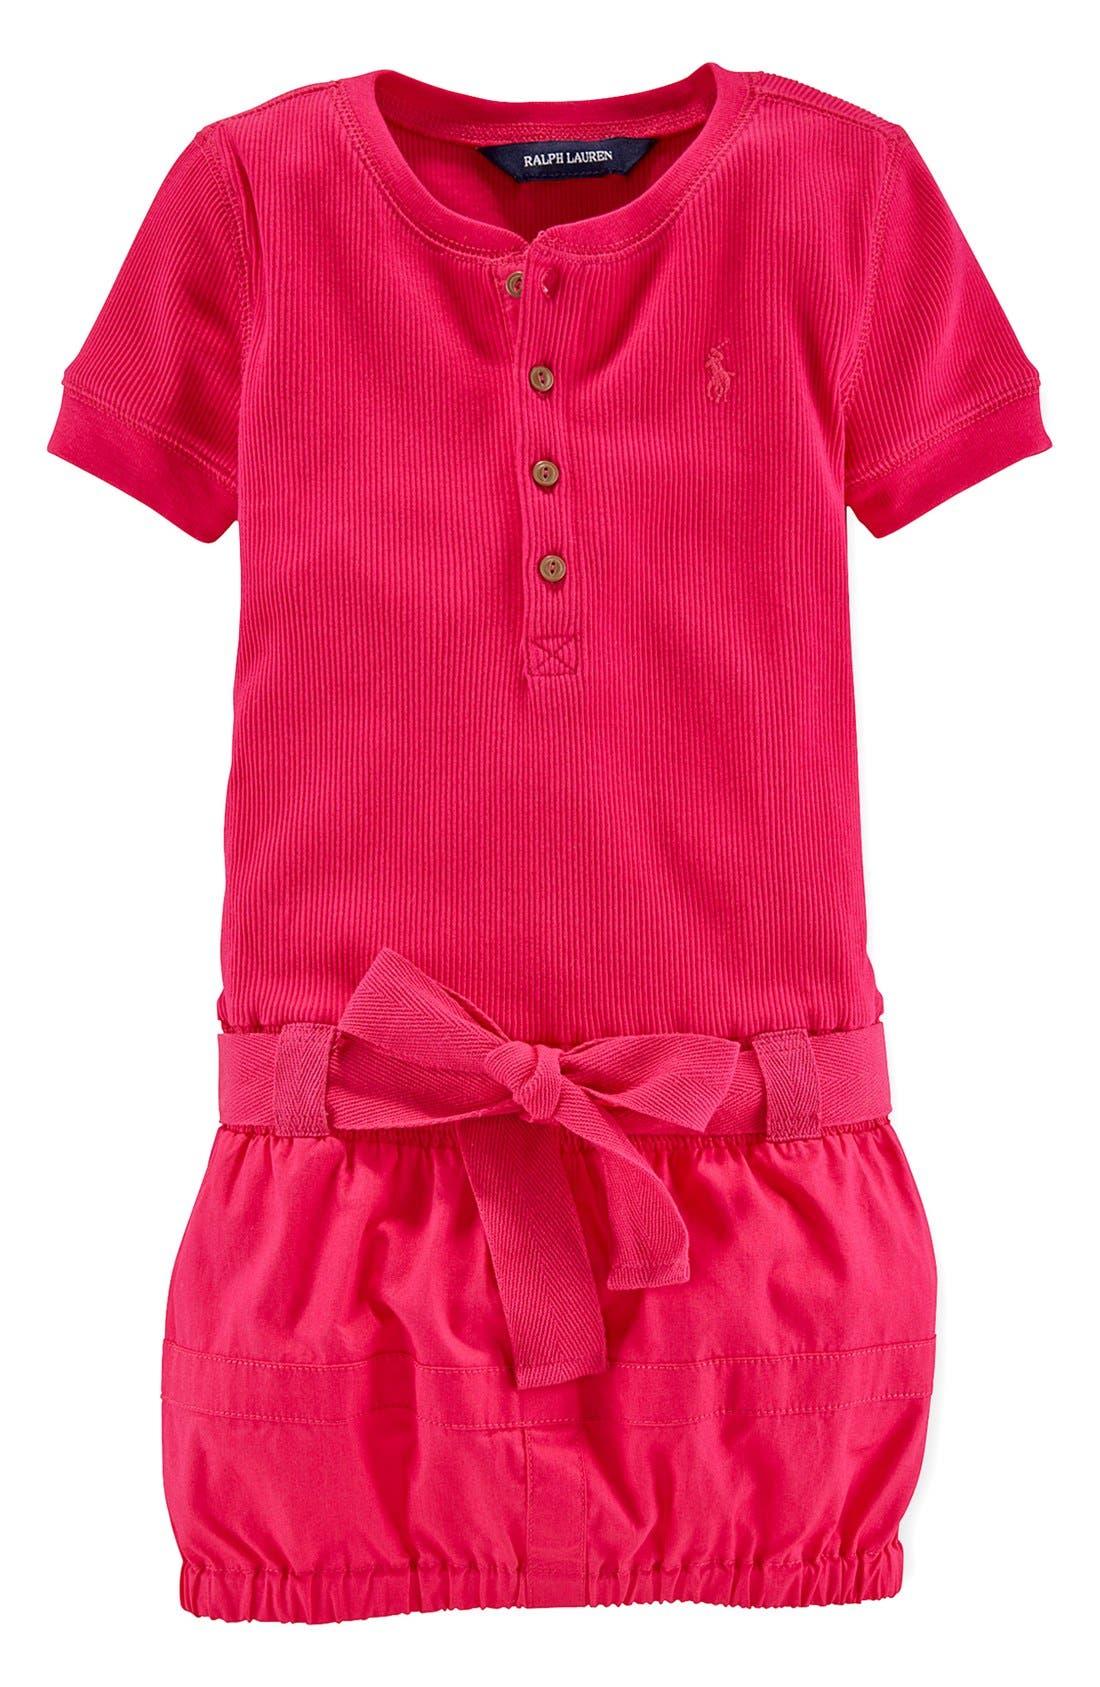 Alternate Image 1 Selected - Ralph Lauren Cotton Cargo Dress (Toddler Girls)